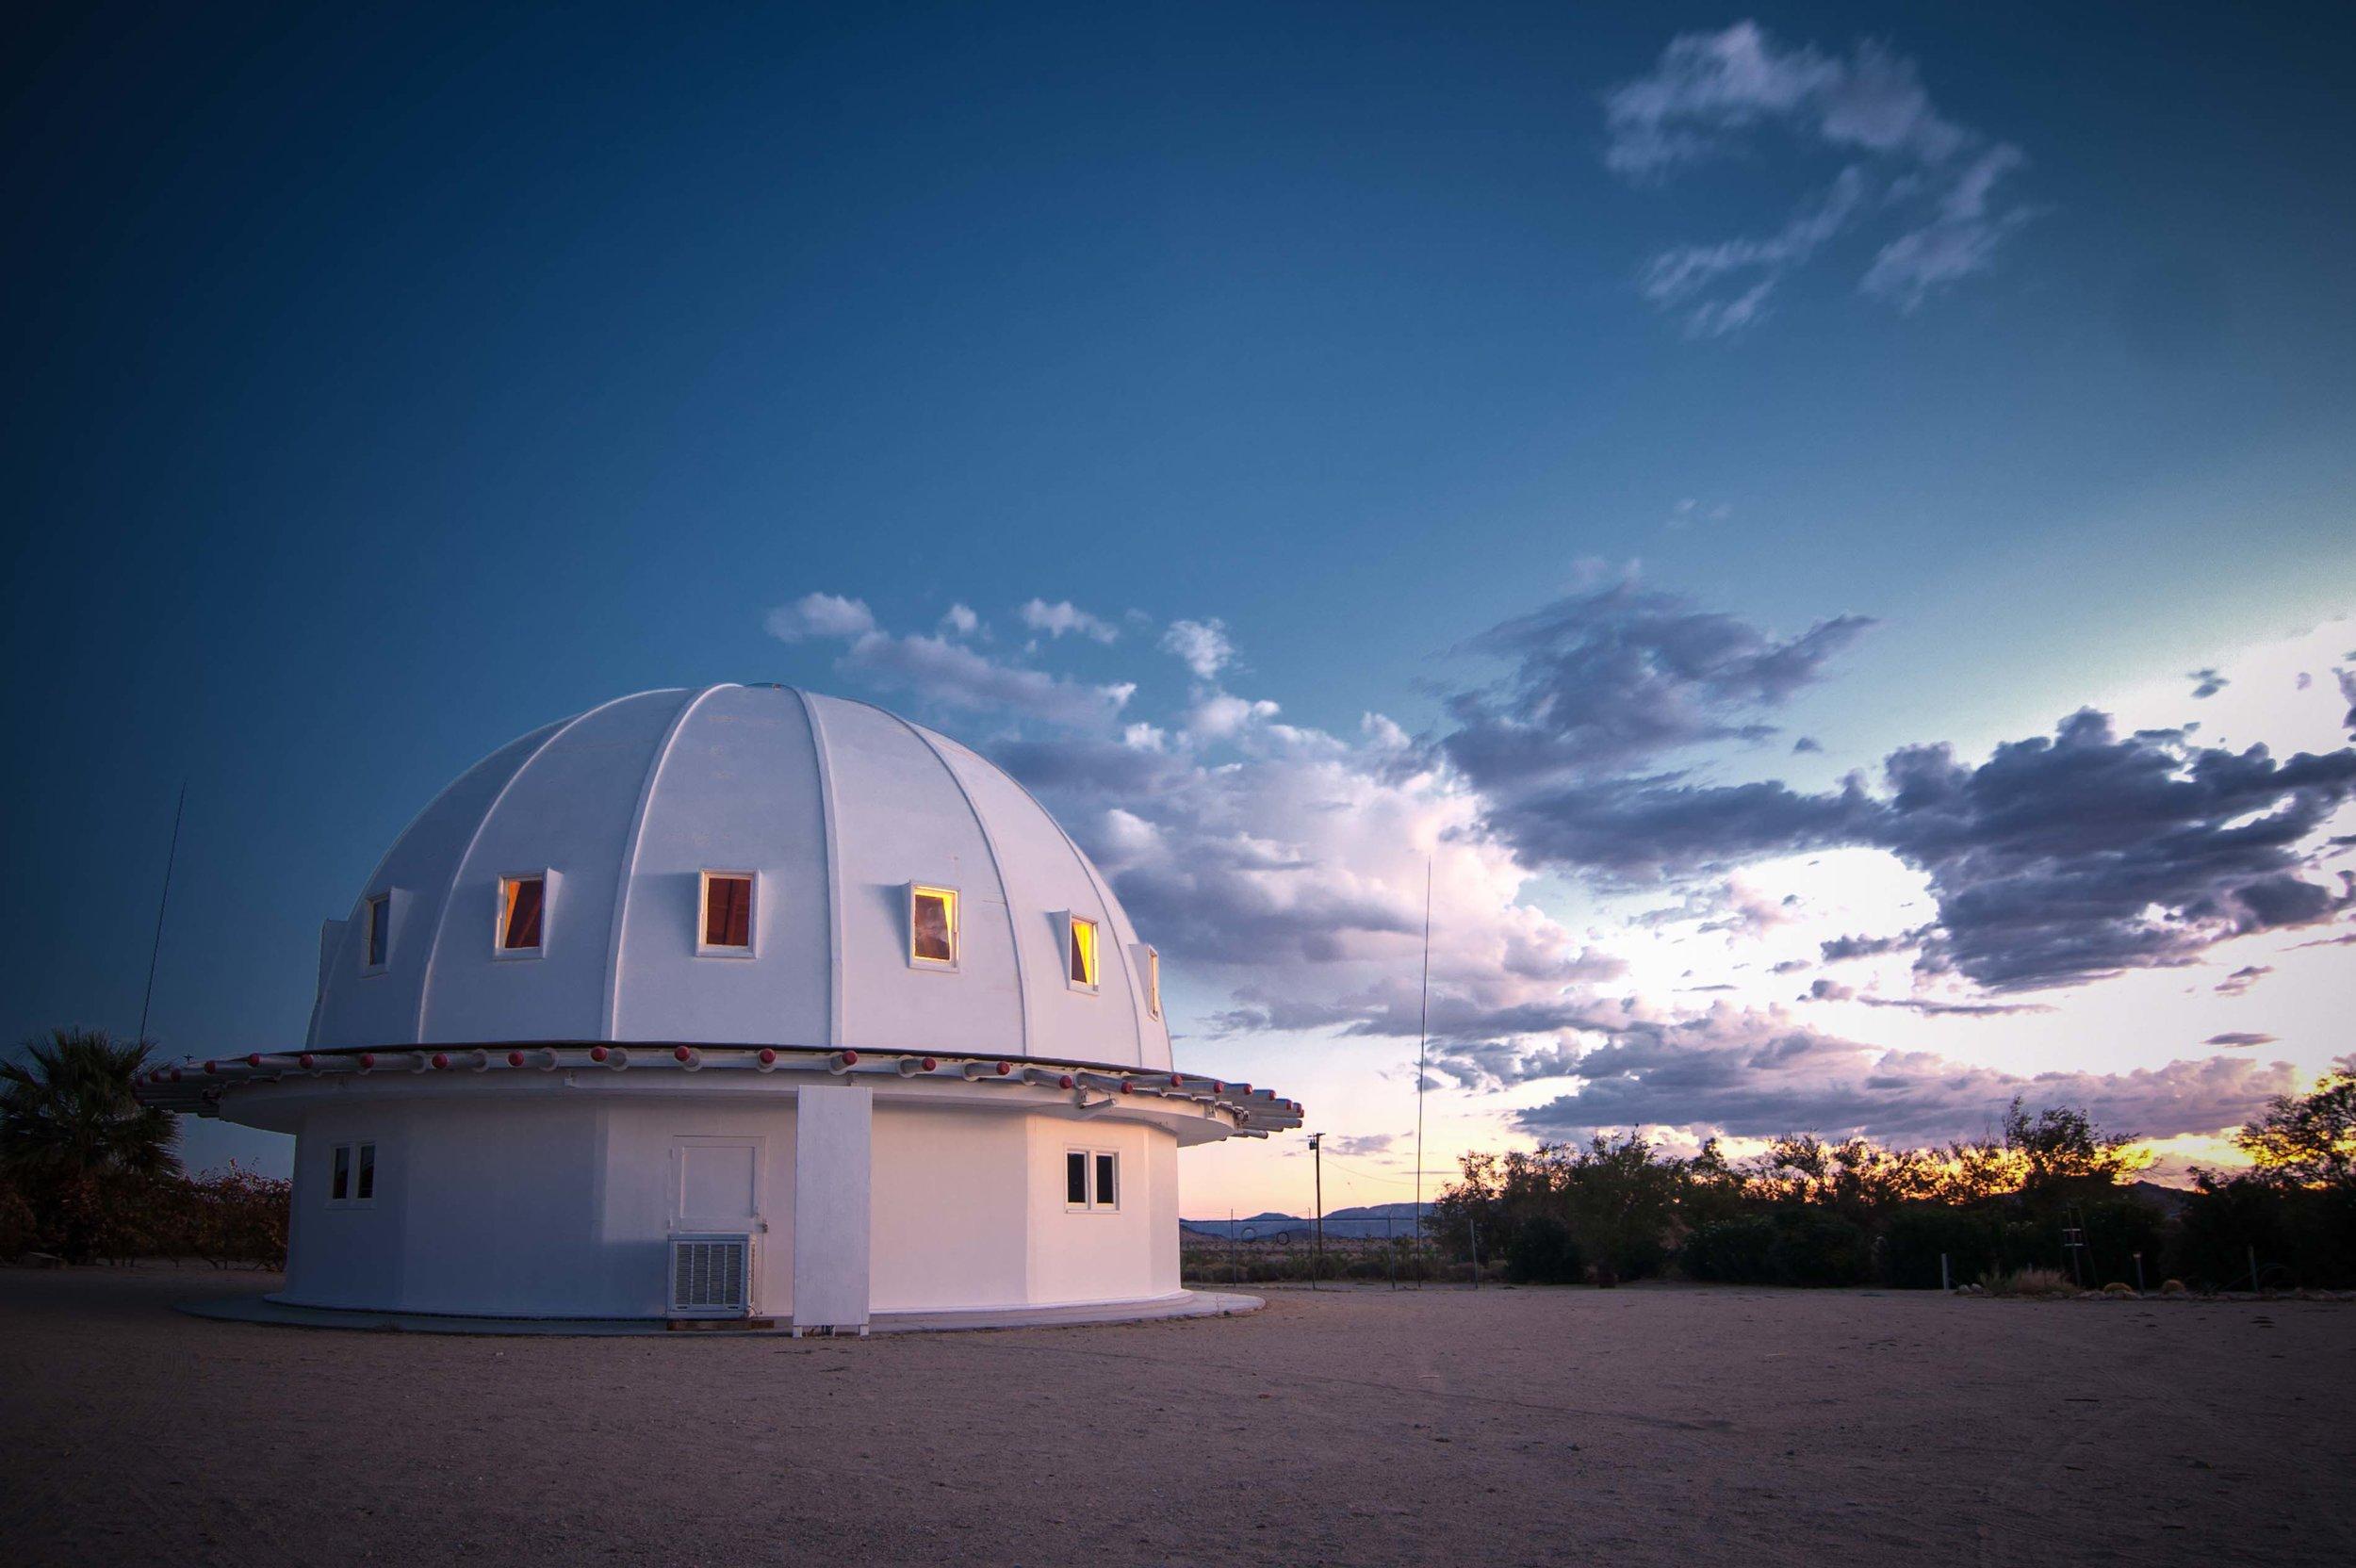 Integraton-dusk-over-the-dome-Photo-credit-Carl-Rice.jpg